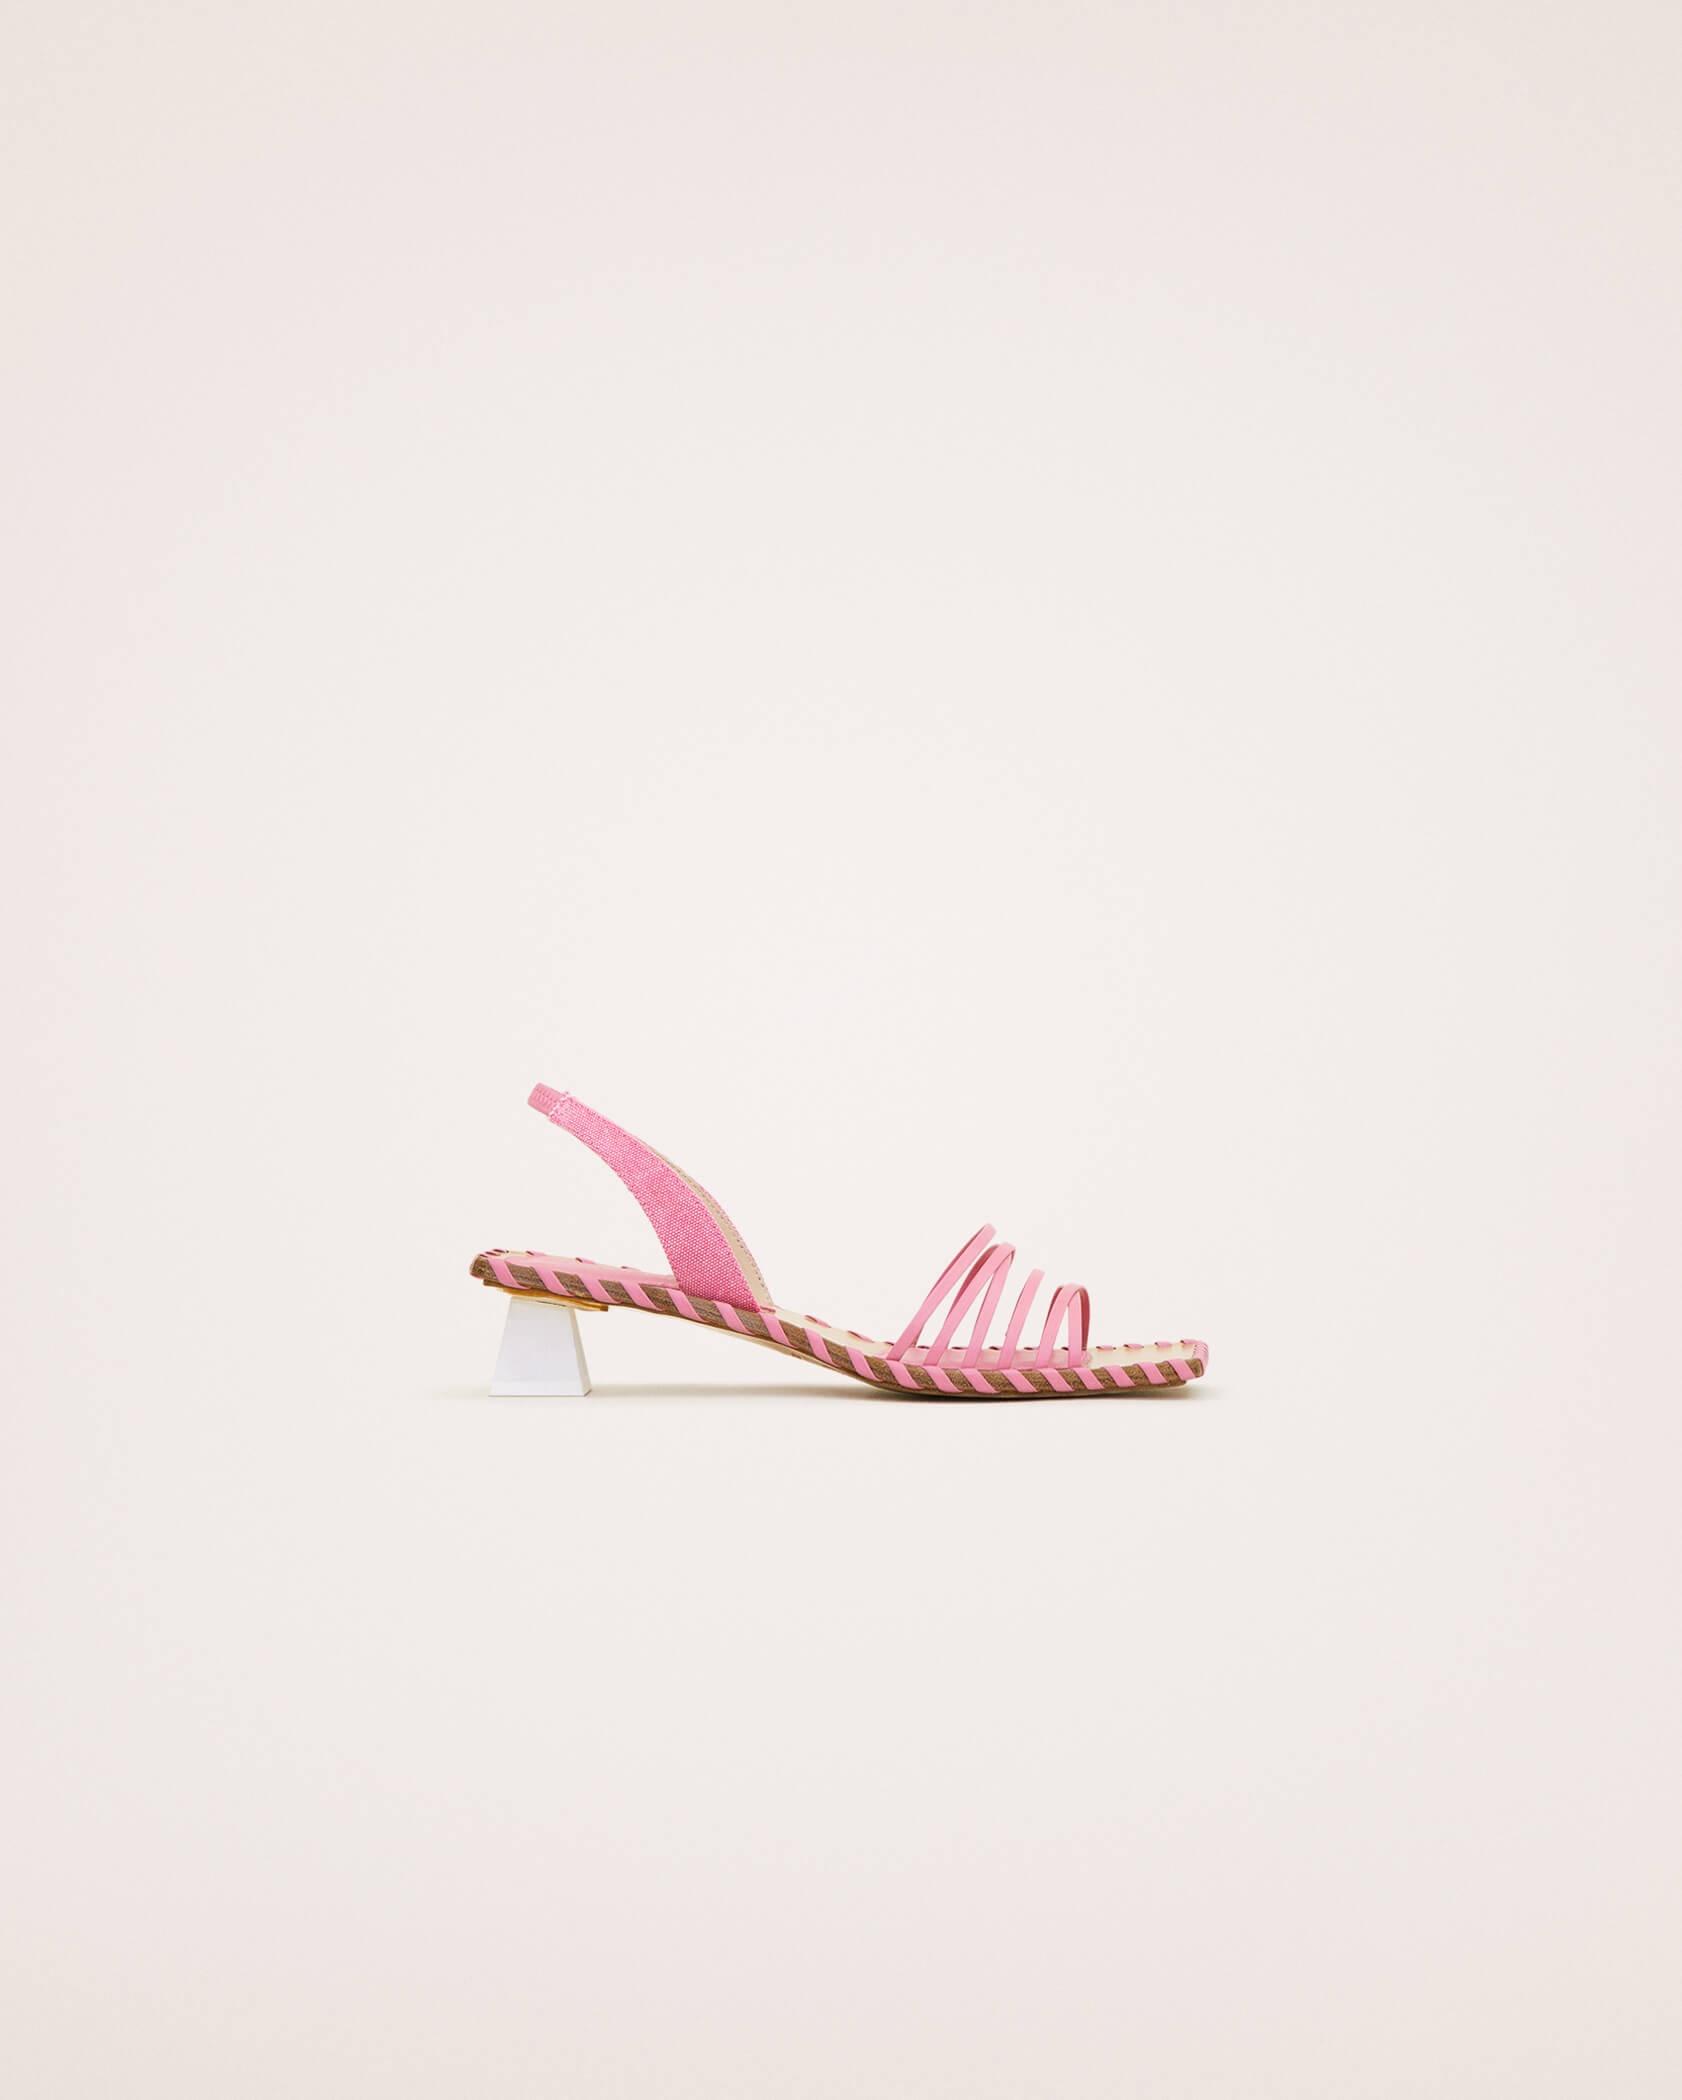 Les sandales Valerie